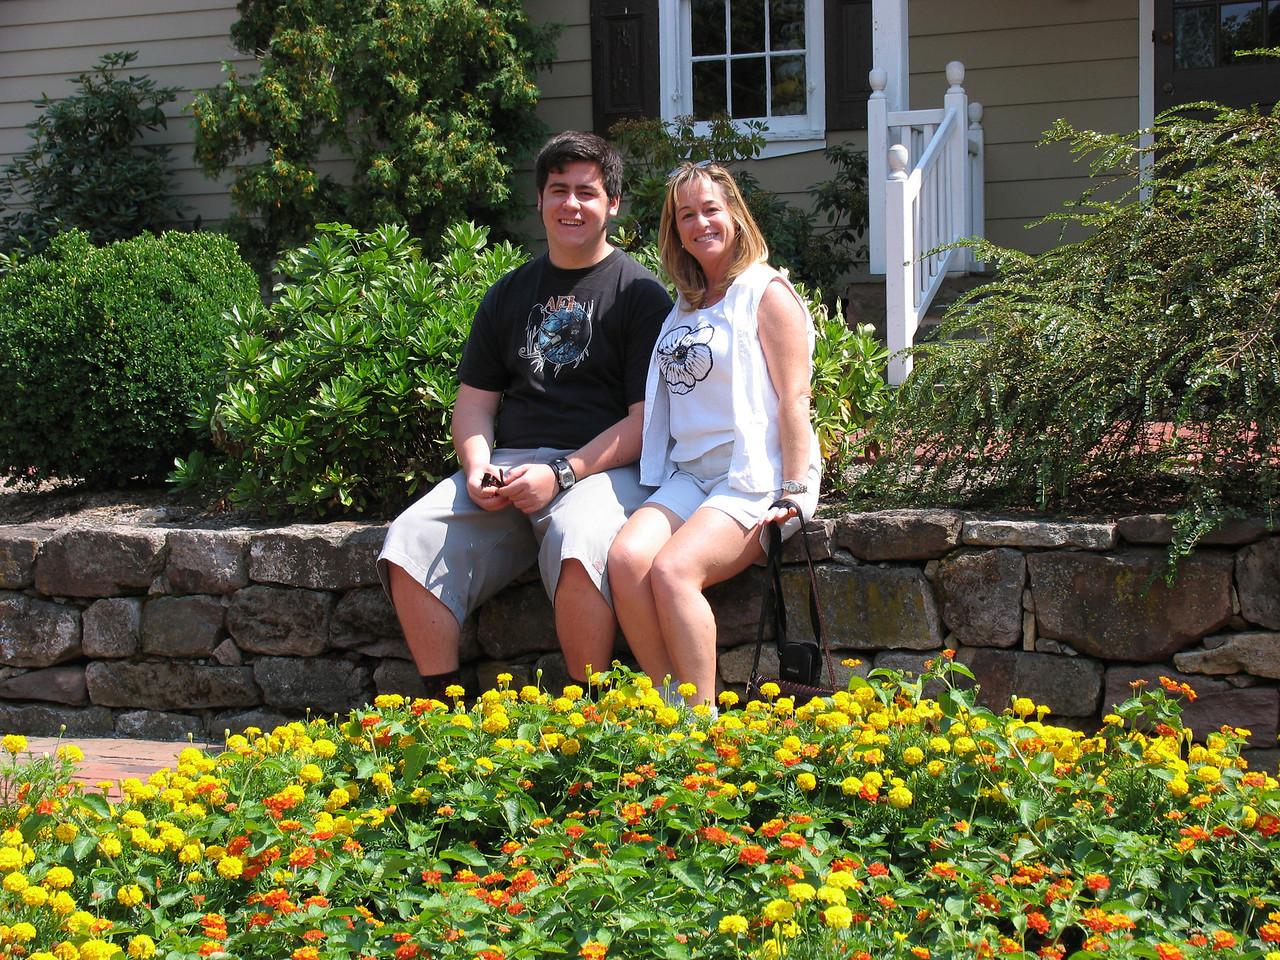 Gina and Jason Martinez in Lambertville, New Jersey - August 2005